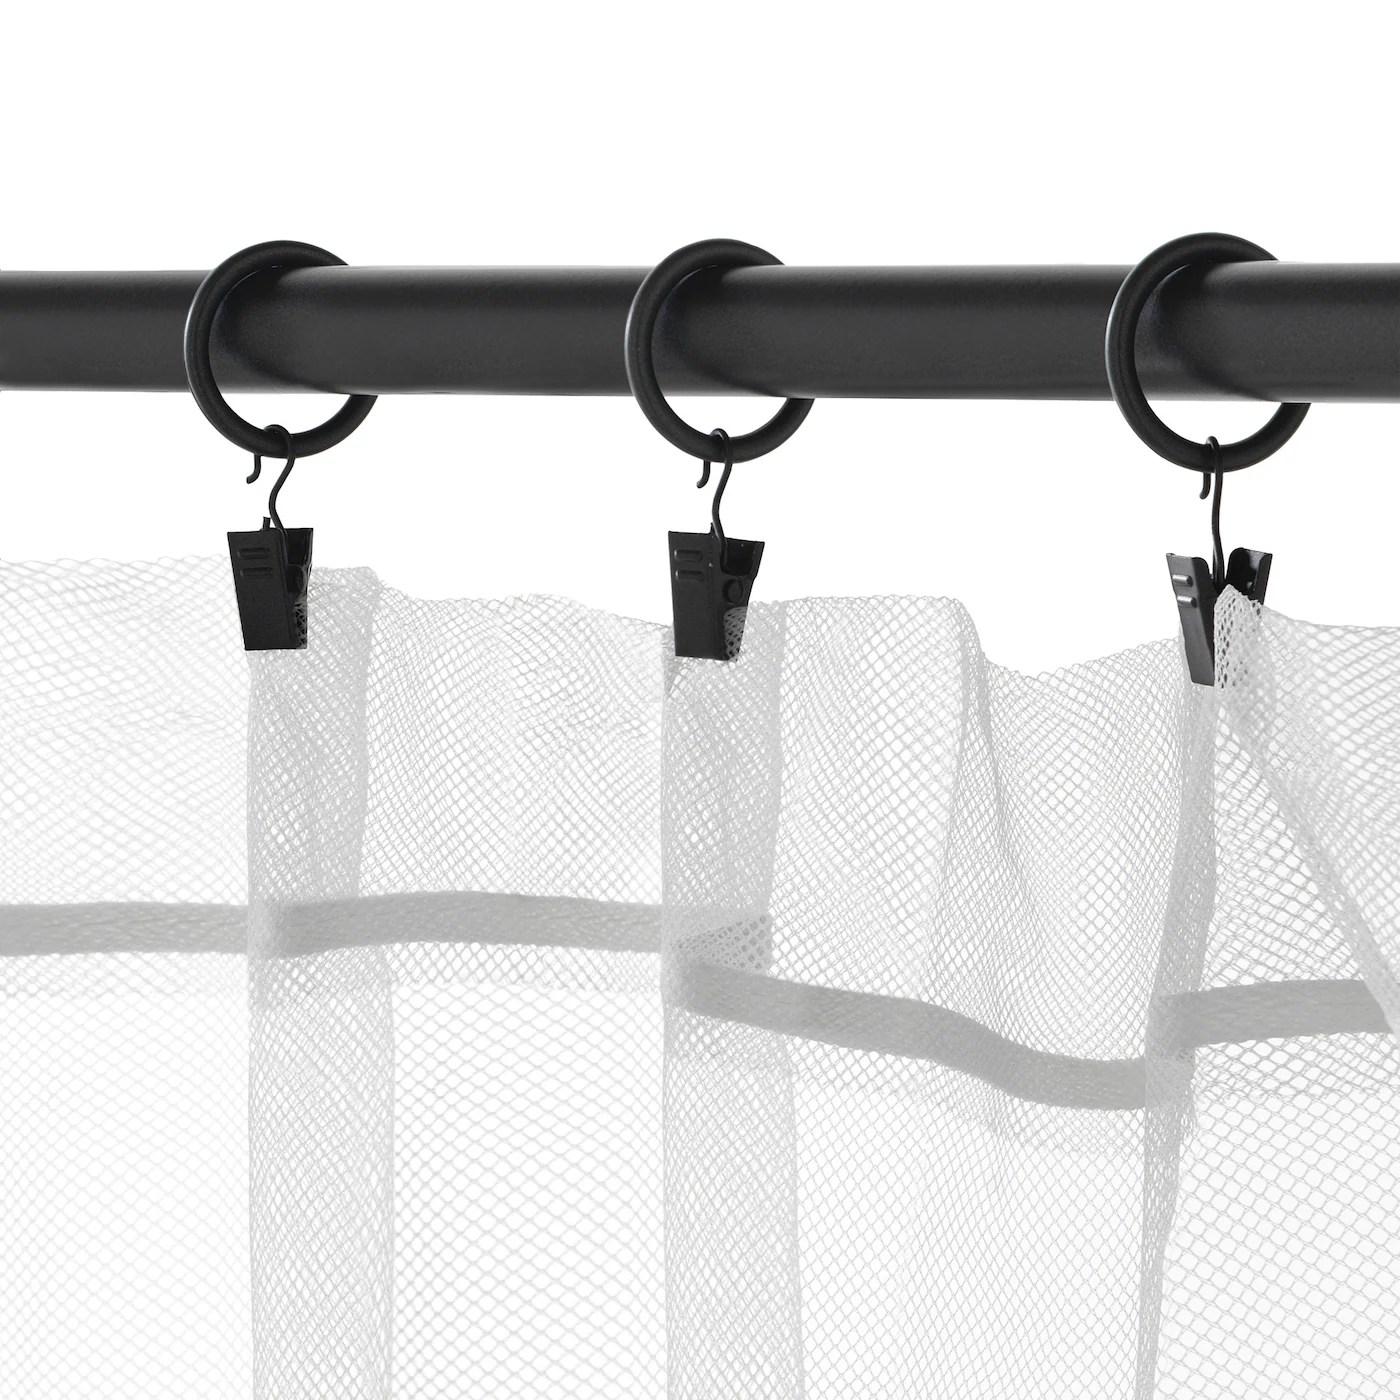 syrlig anneau rideau clip crochet noir 25 mm